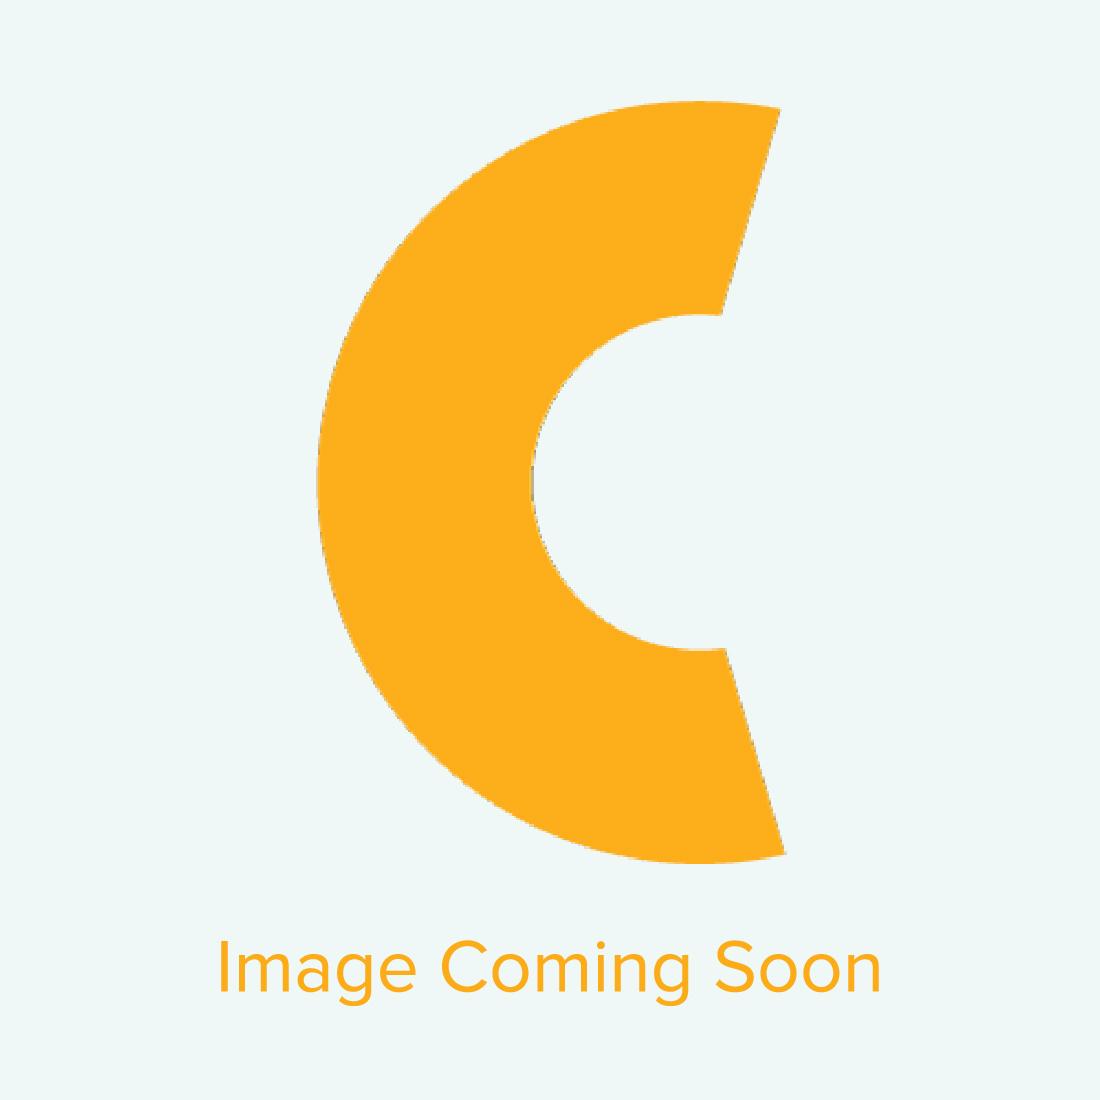 "AIT 162CR Slide-O-Mat Pneaumatic Heat Transfer Press - 24"" x 36"""